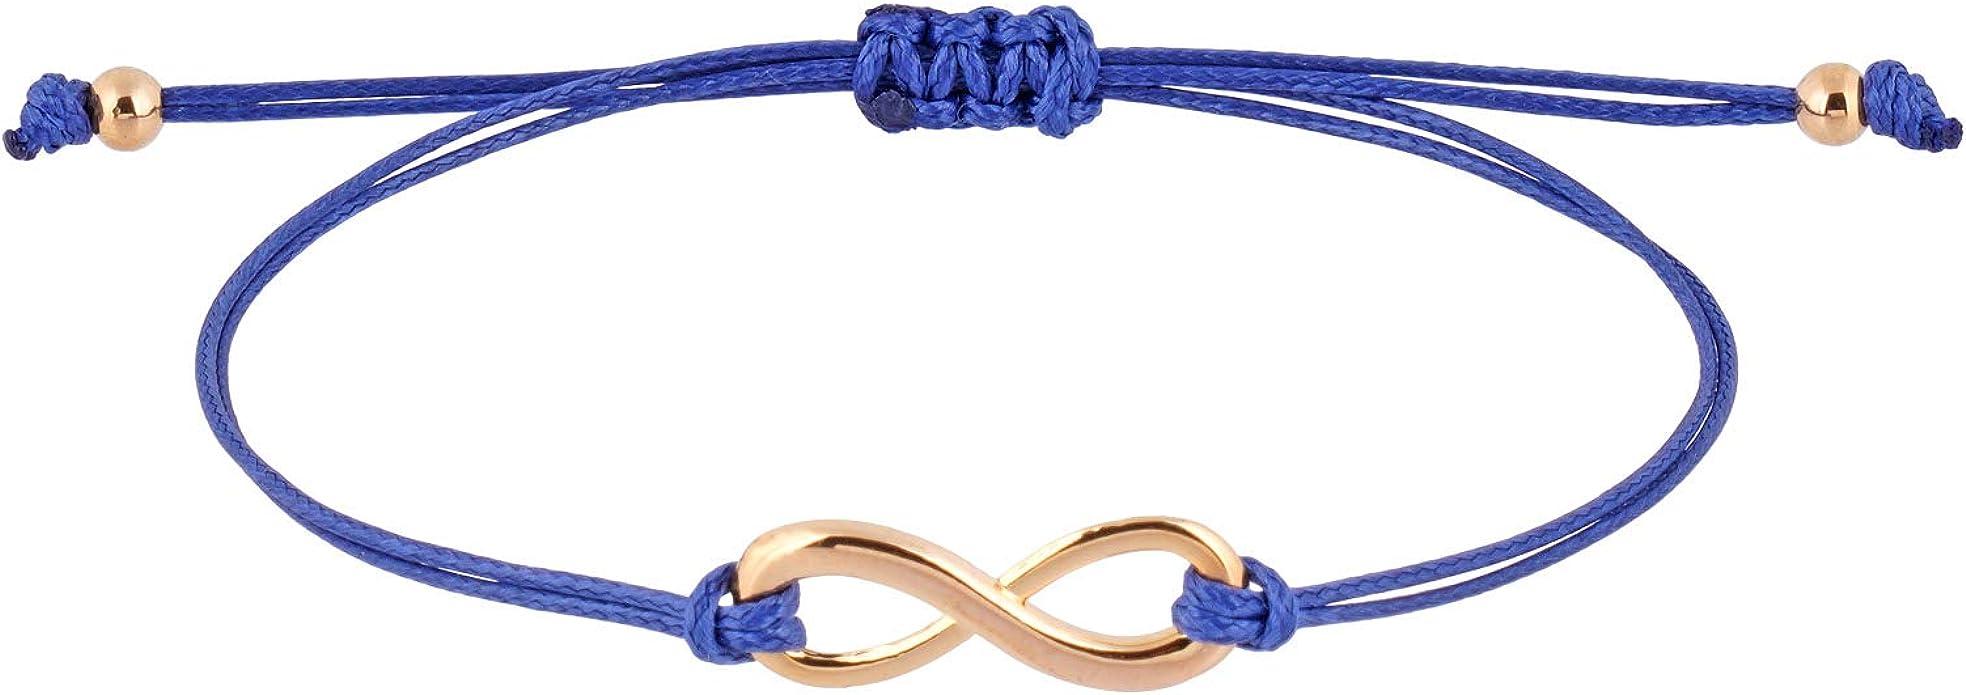 2 Stück Damen Mädchen Freundschaftsarmbänder Unendlichkeit Armband Silber Strass